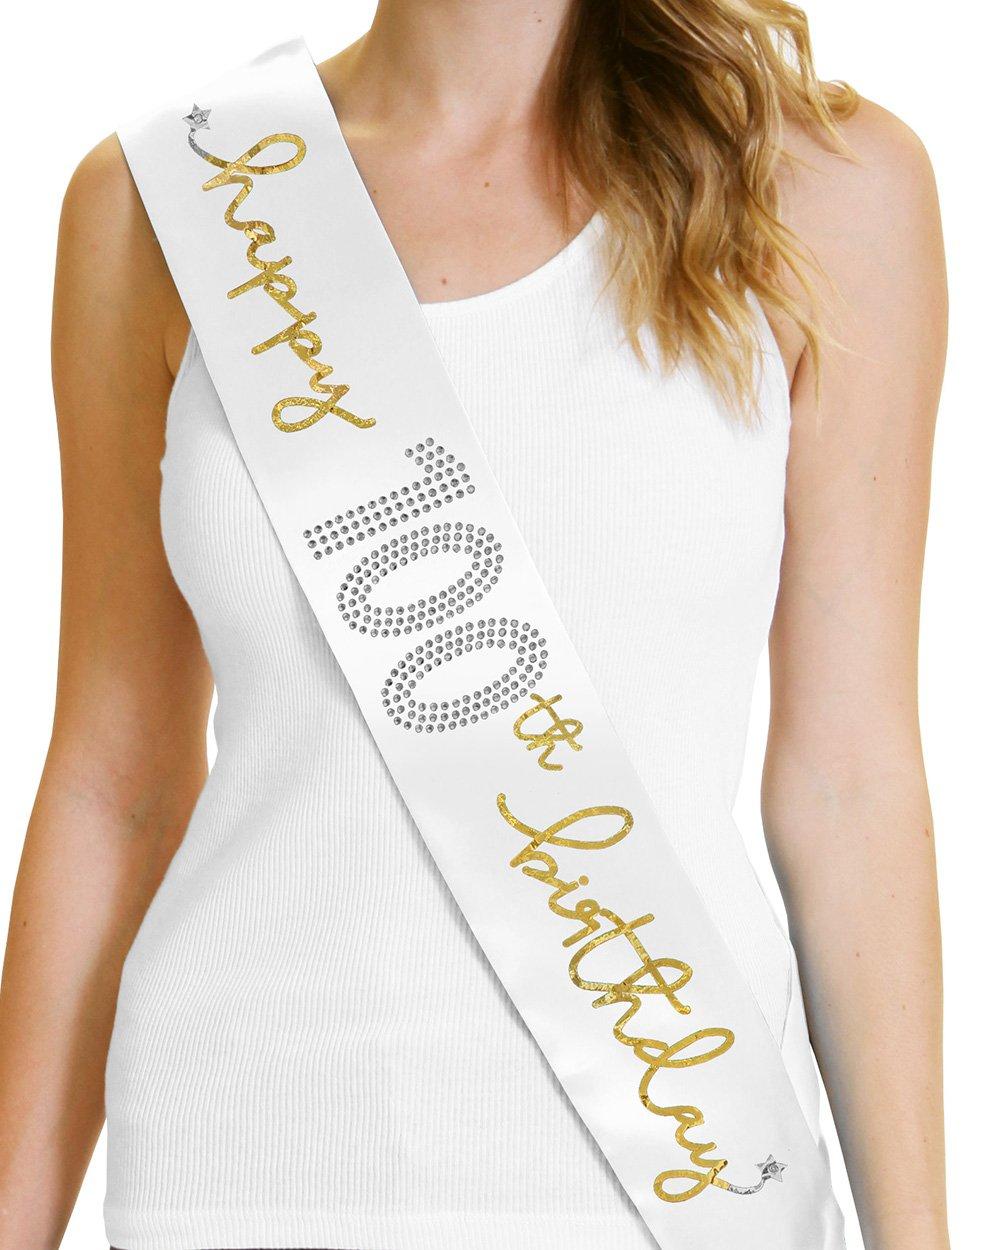 Happy 100th Birthday Metallic Gold Saitn Sash 100th Birthday Party Decorations White Sash(Hpy100Bday Gld) WHT